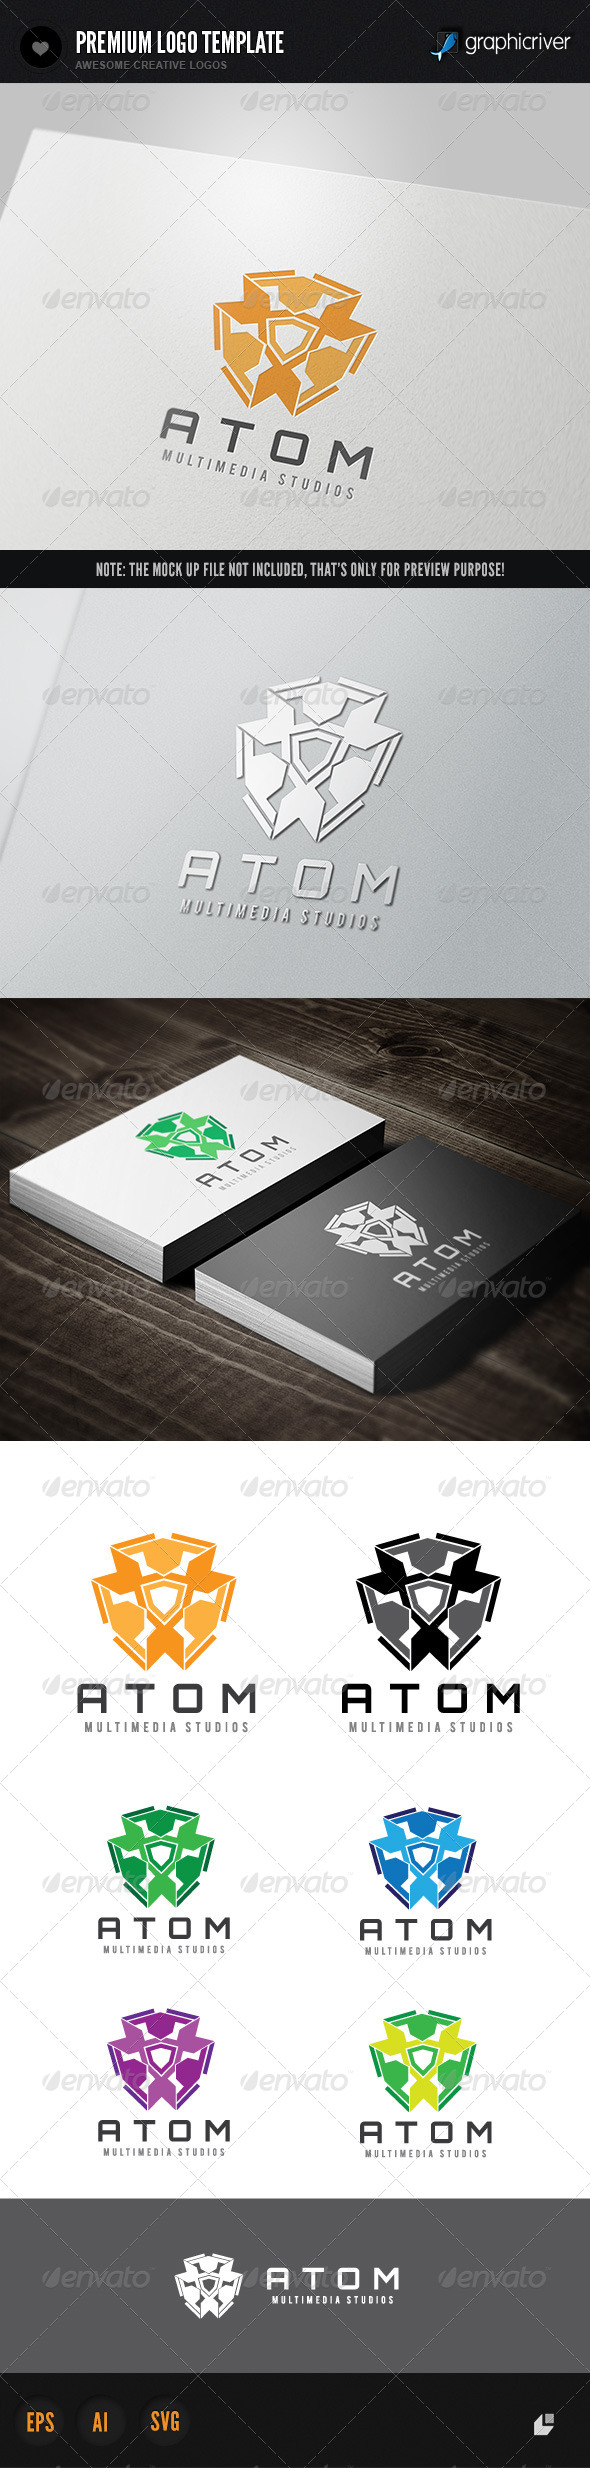 GraphicRiver Multimedia Studio Atom 2 7201880